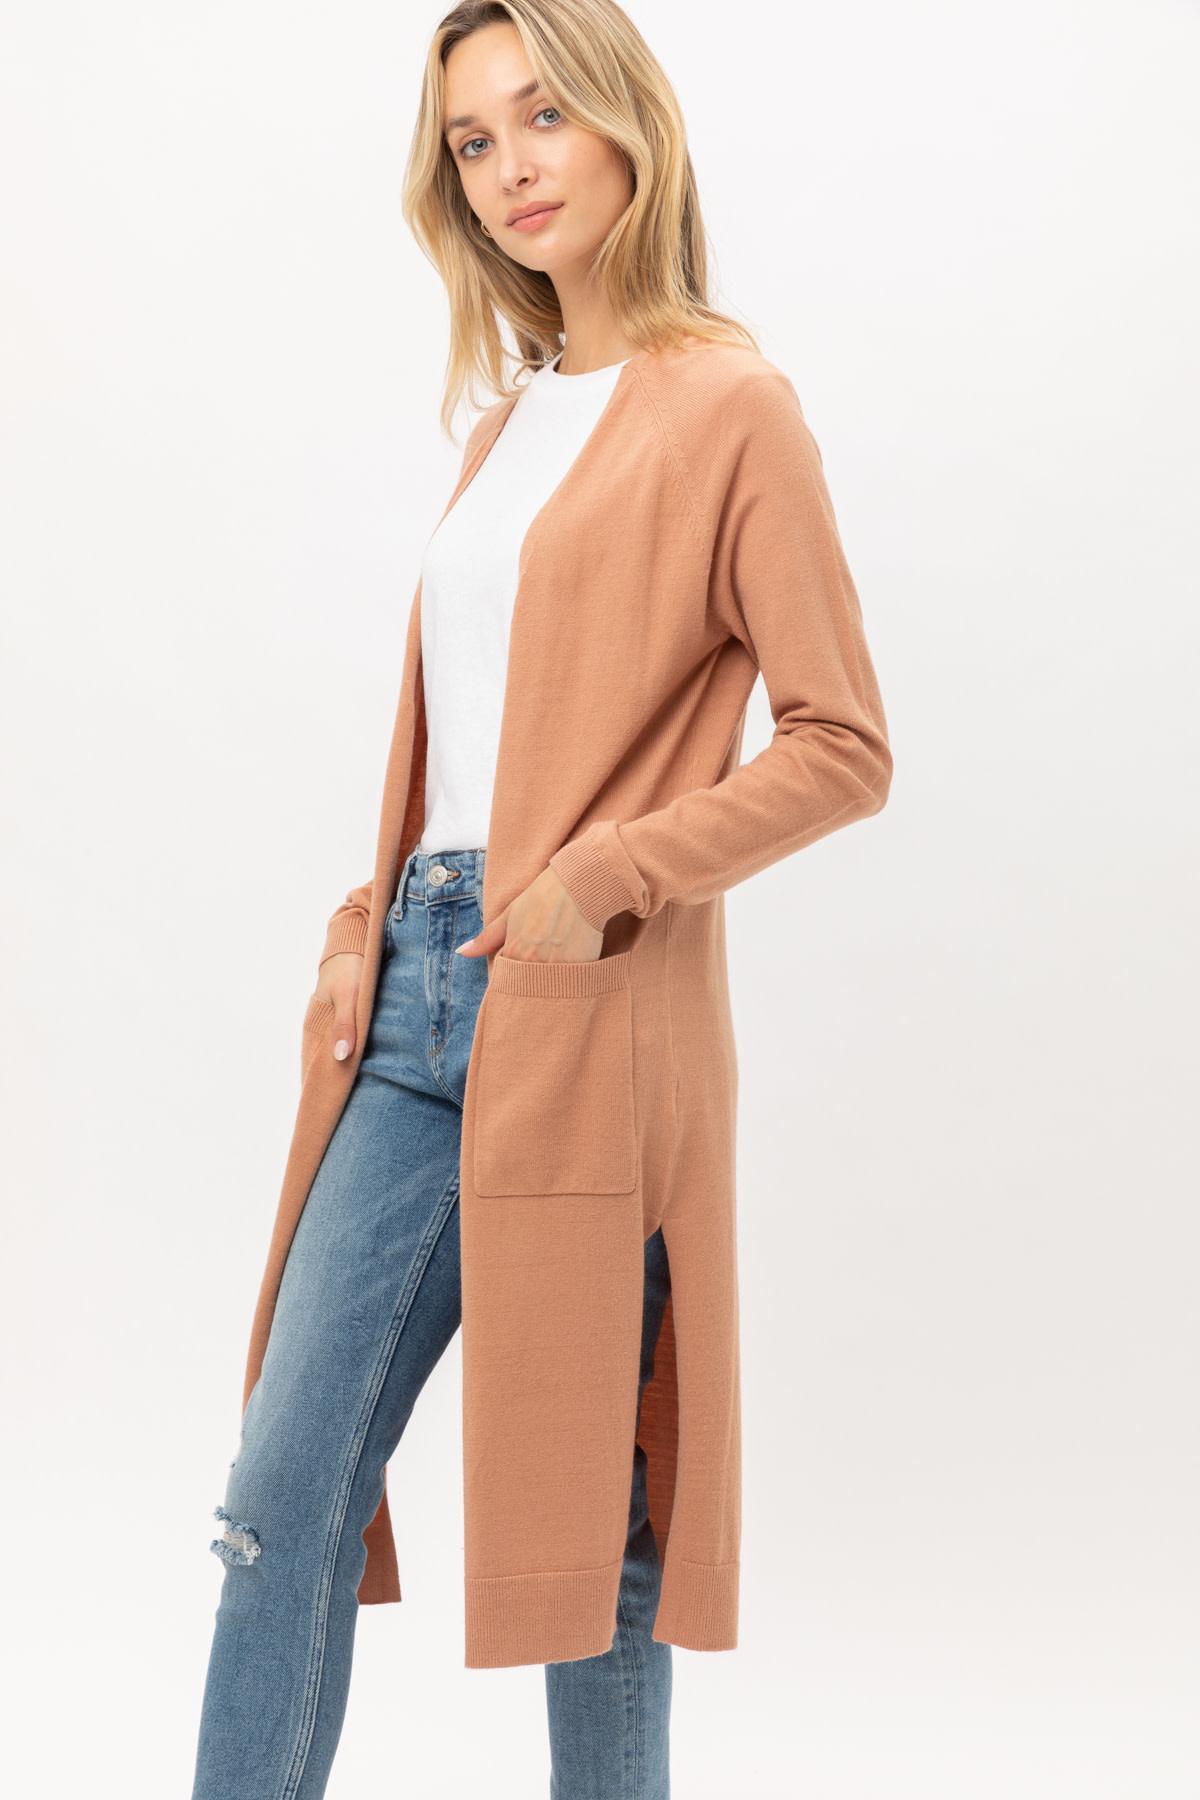 Fleurish Home Long Lightweight Cardigan w Pockets